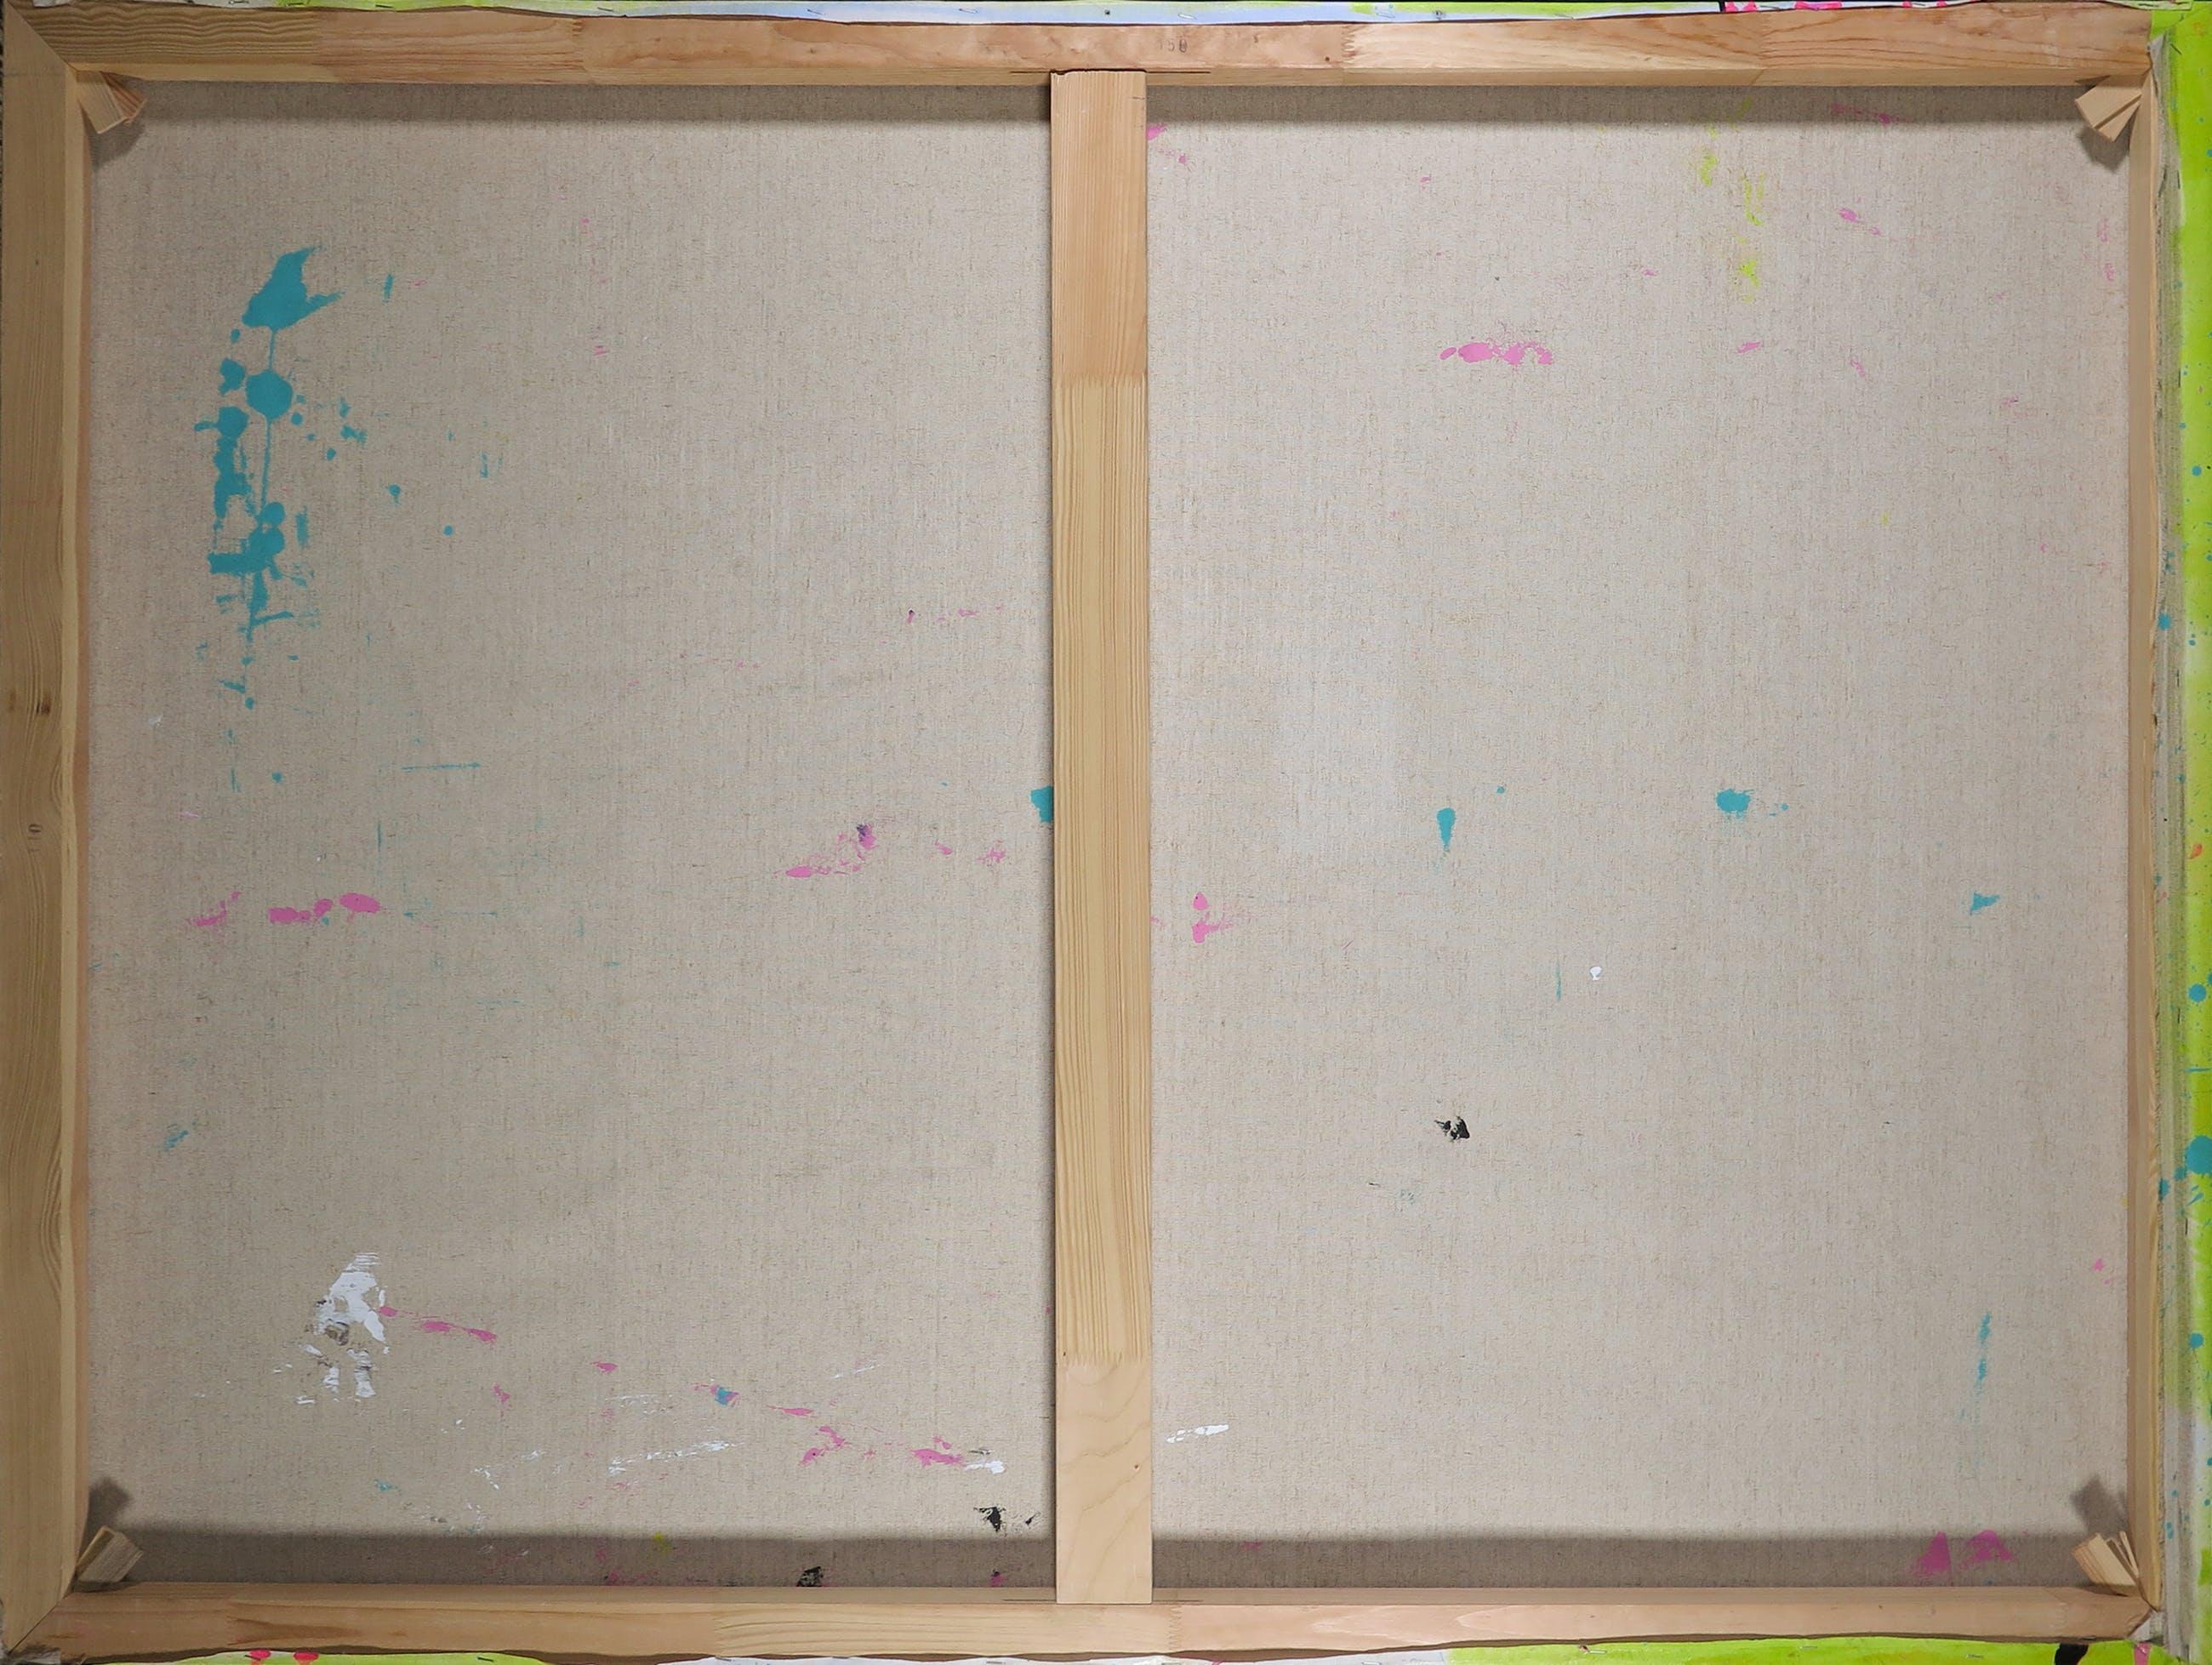 Ronald Chapeau - Gemengde techniek op doek, Knock on Wood (Groot) kopen? Bied vanaf 1!